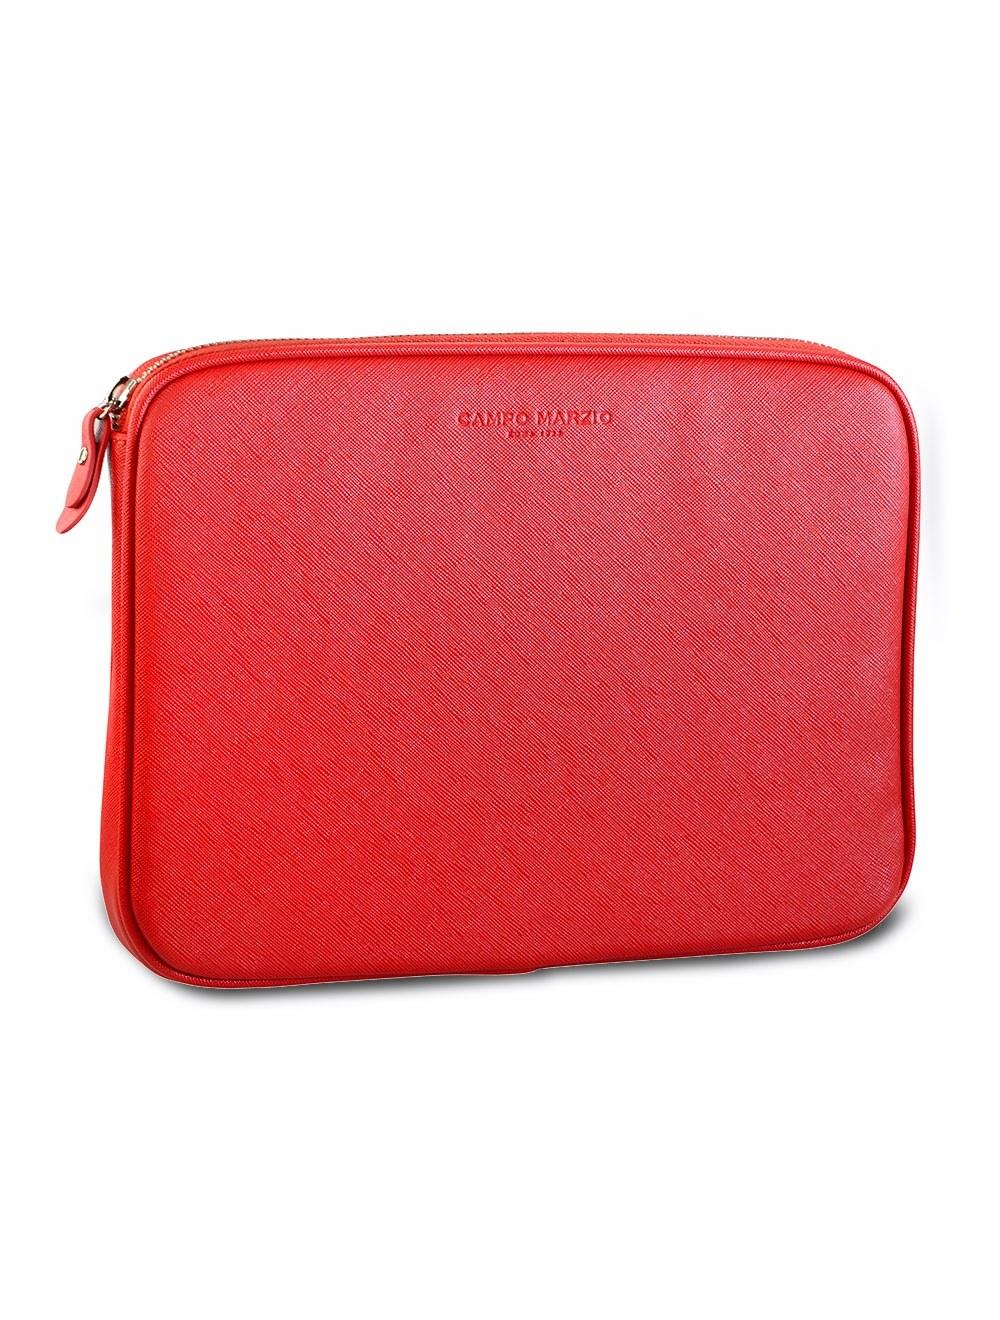 "Laptop Sleeve 13"" - Cherry Red"